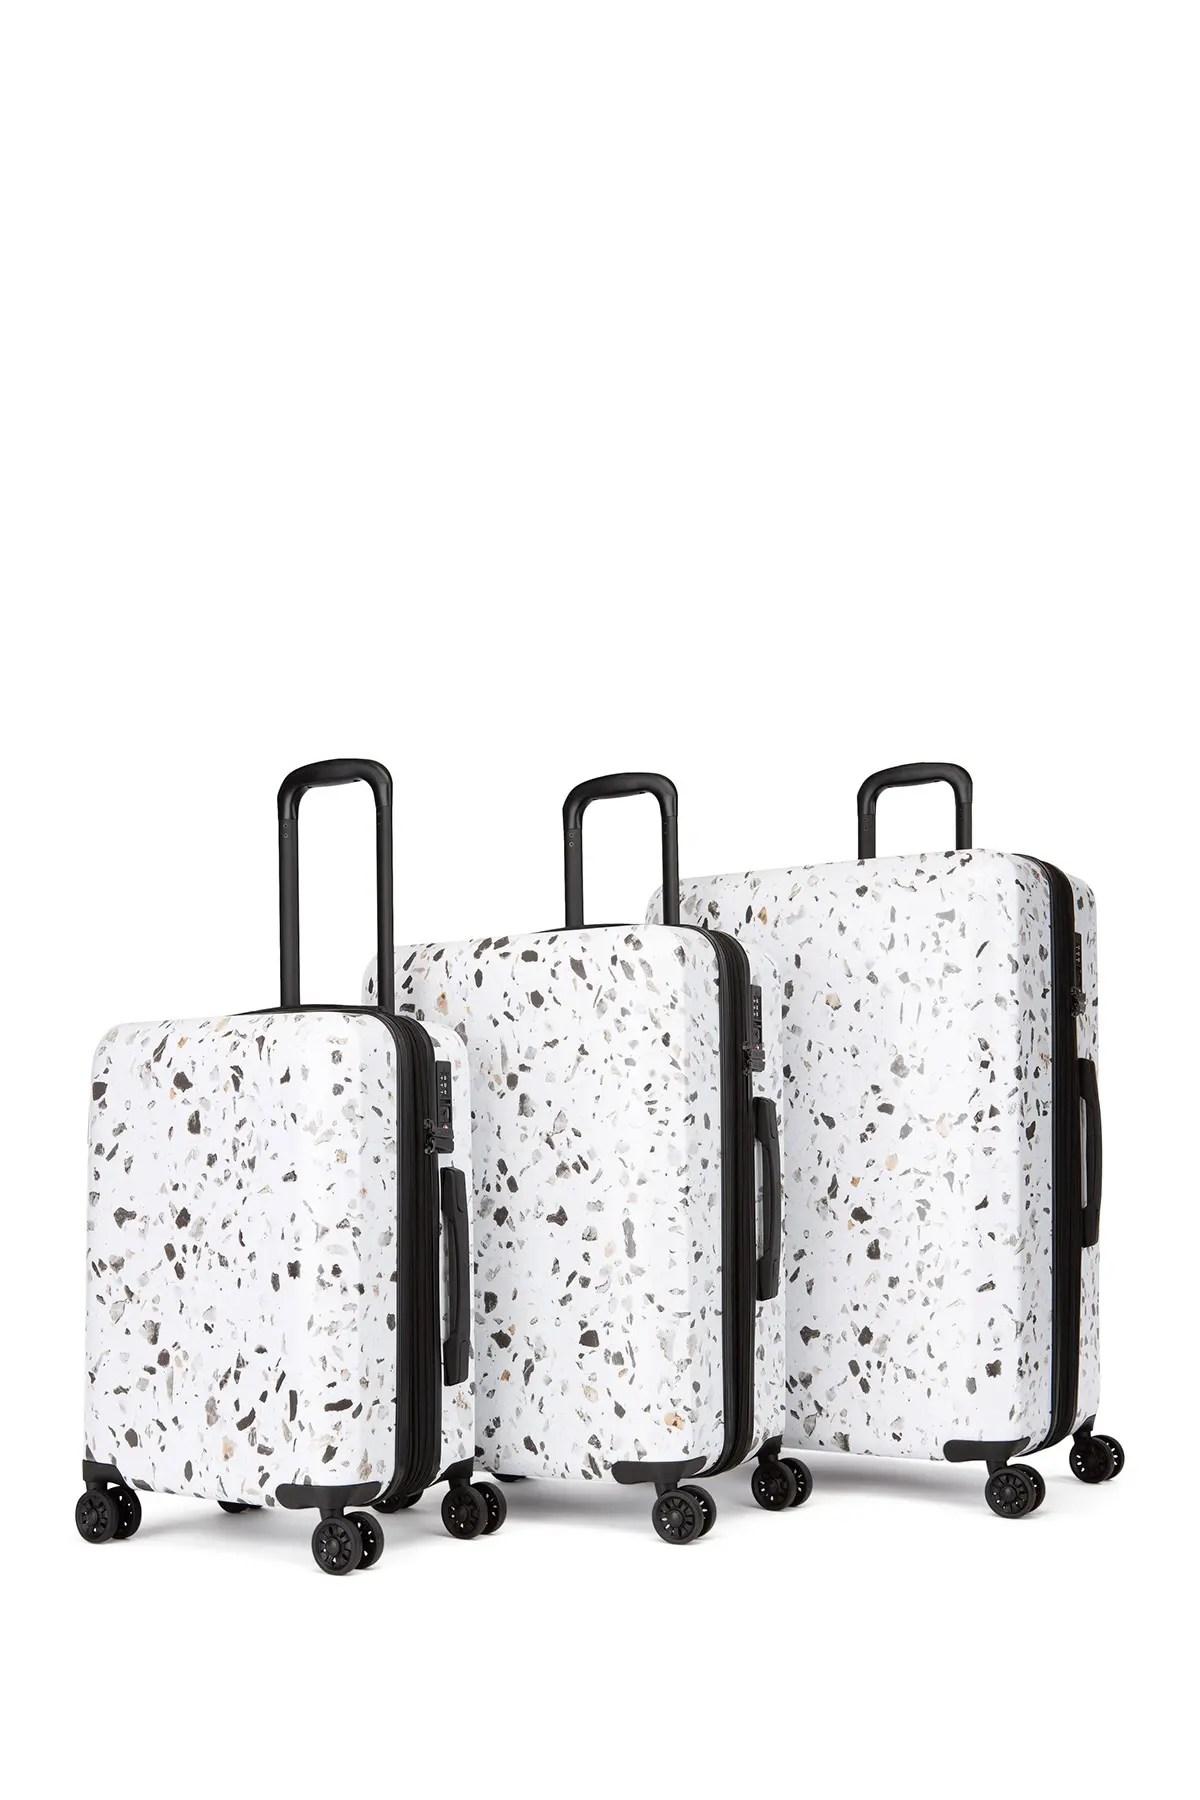 calpak luggage terrazzo 3 piece luggage set nordstrom rack